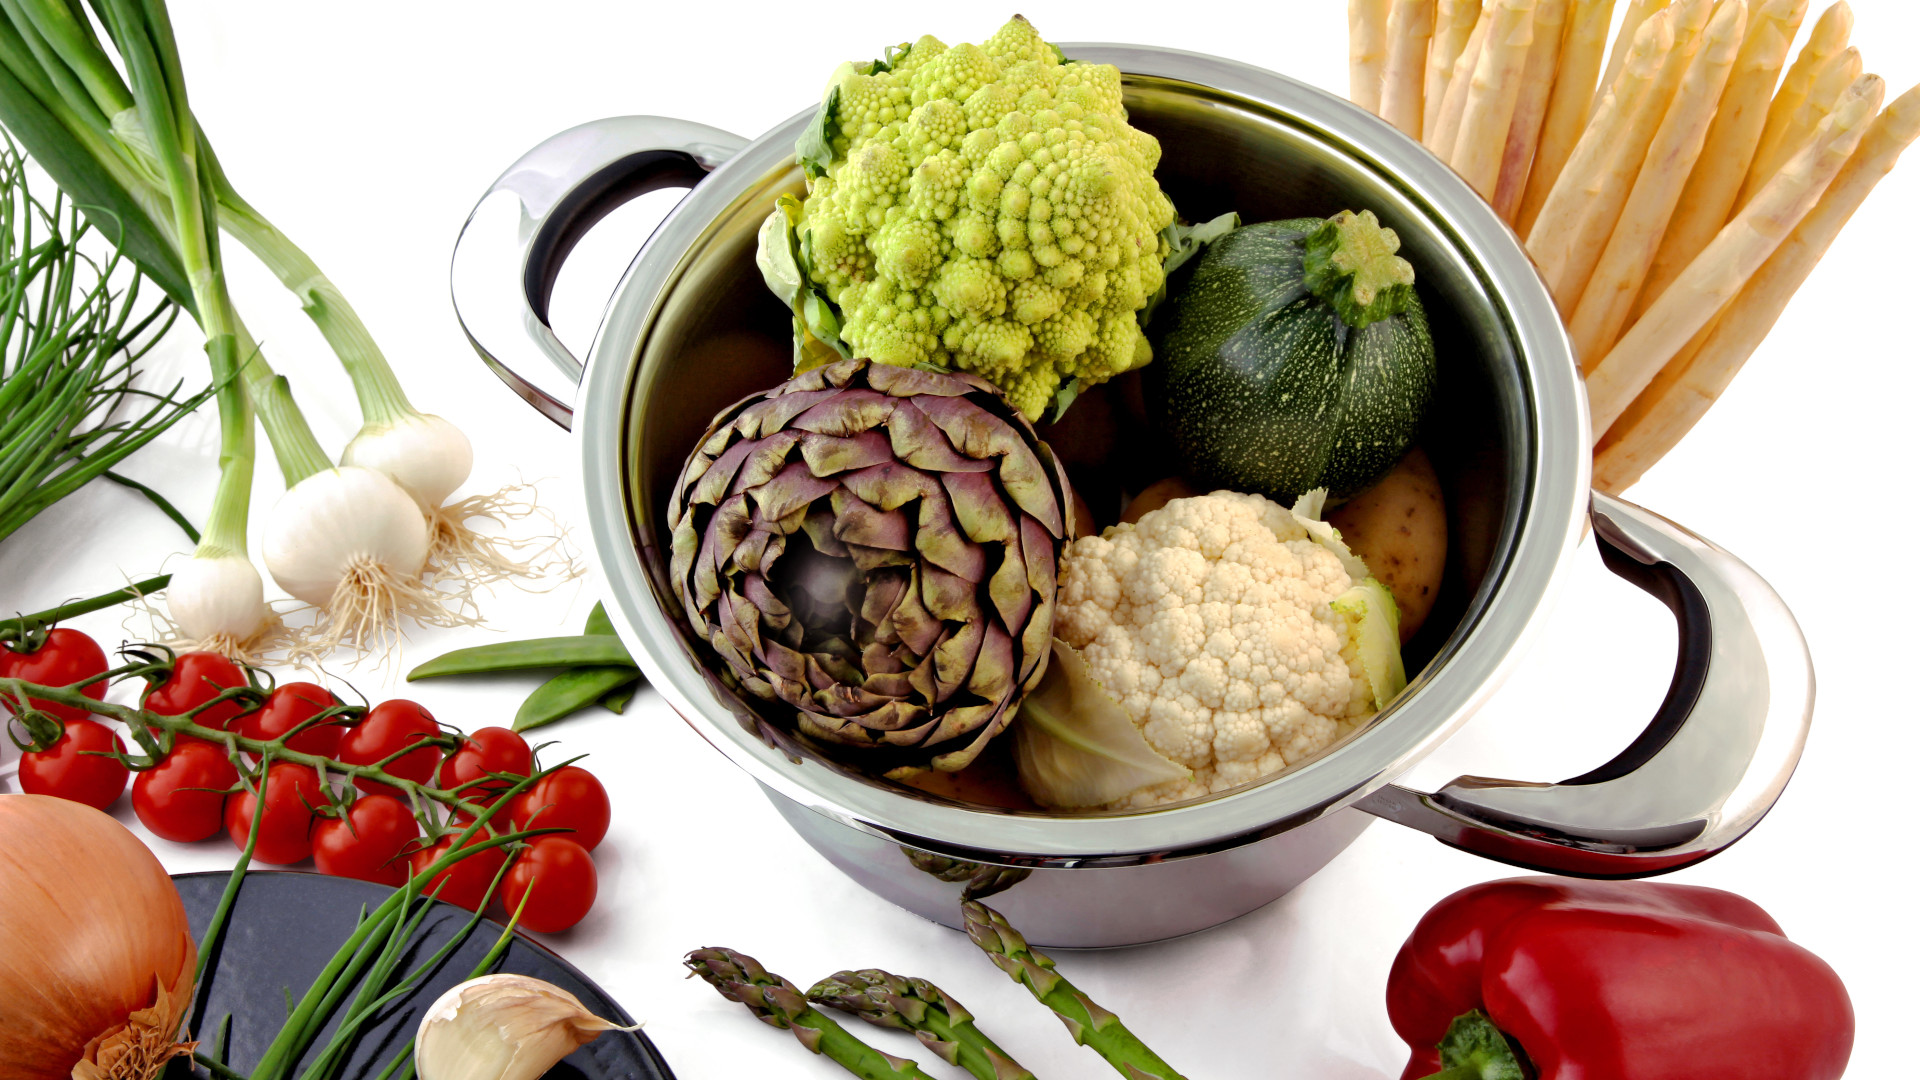 vanessa-lopez-blog-naturopathie-cuisson-basse-temperature-meilleurs-mo